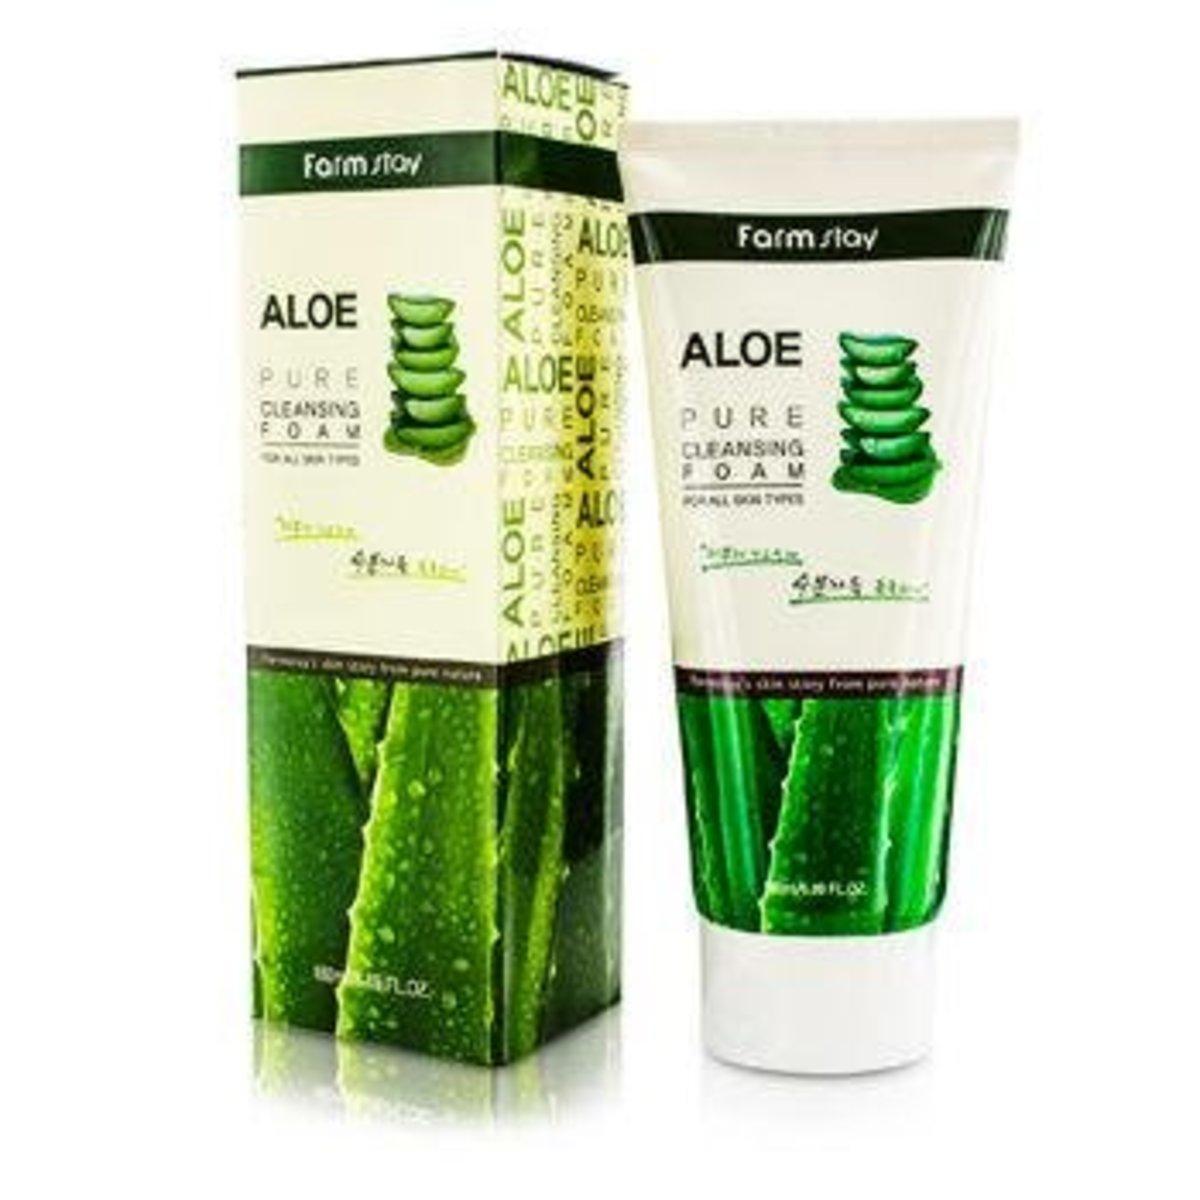 Aloe Pure Cleansing Foam 180ml